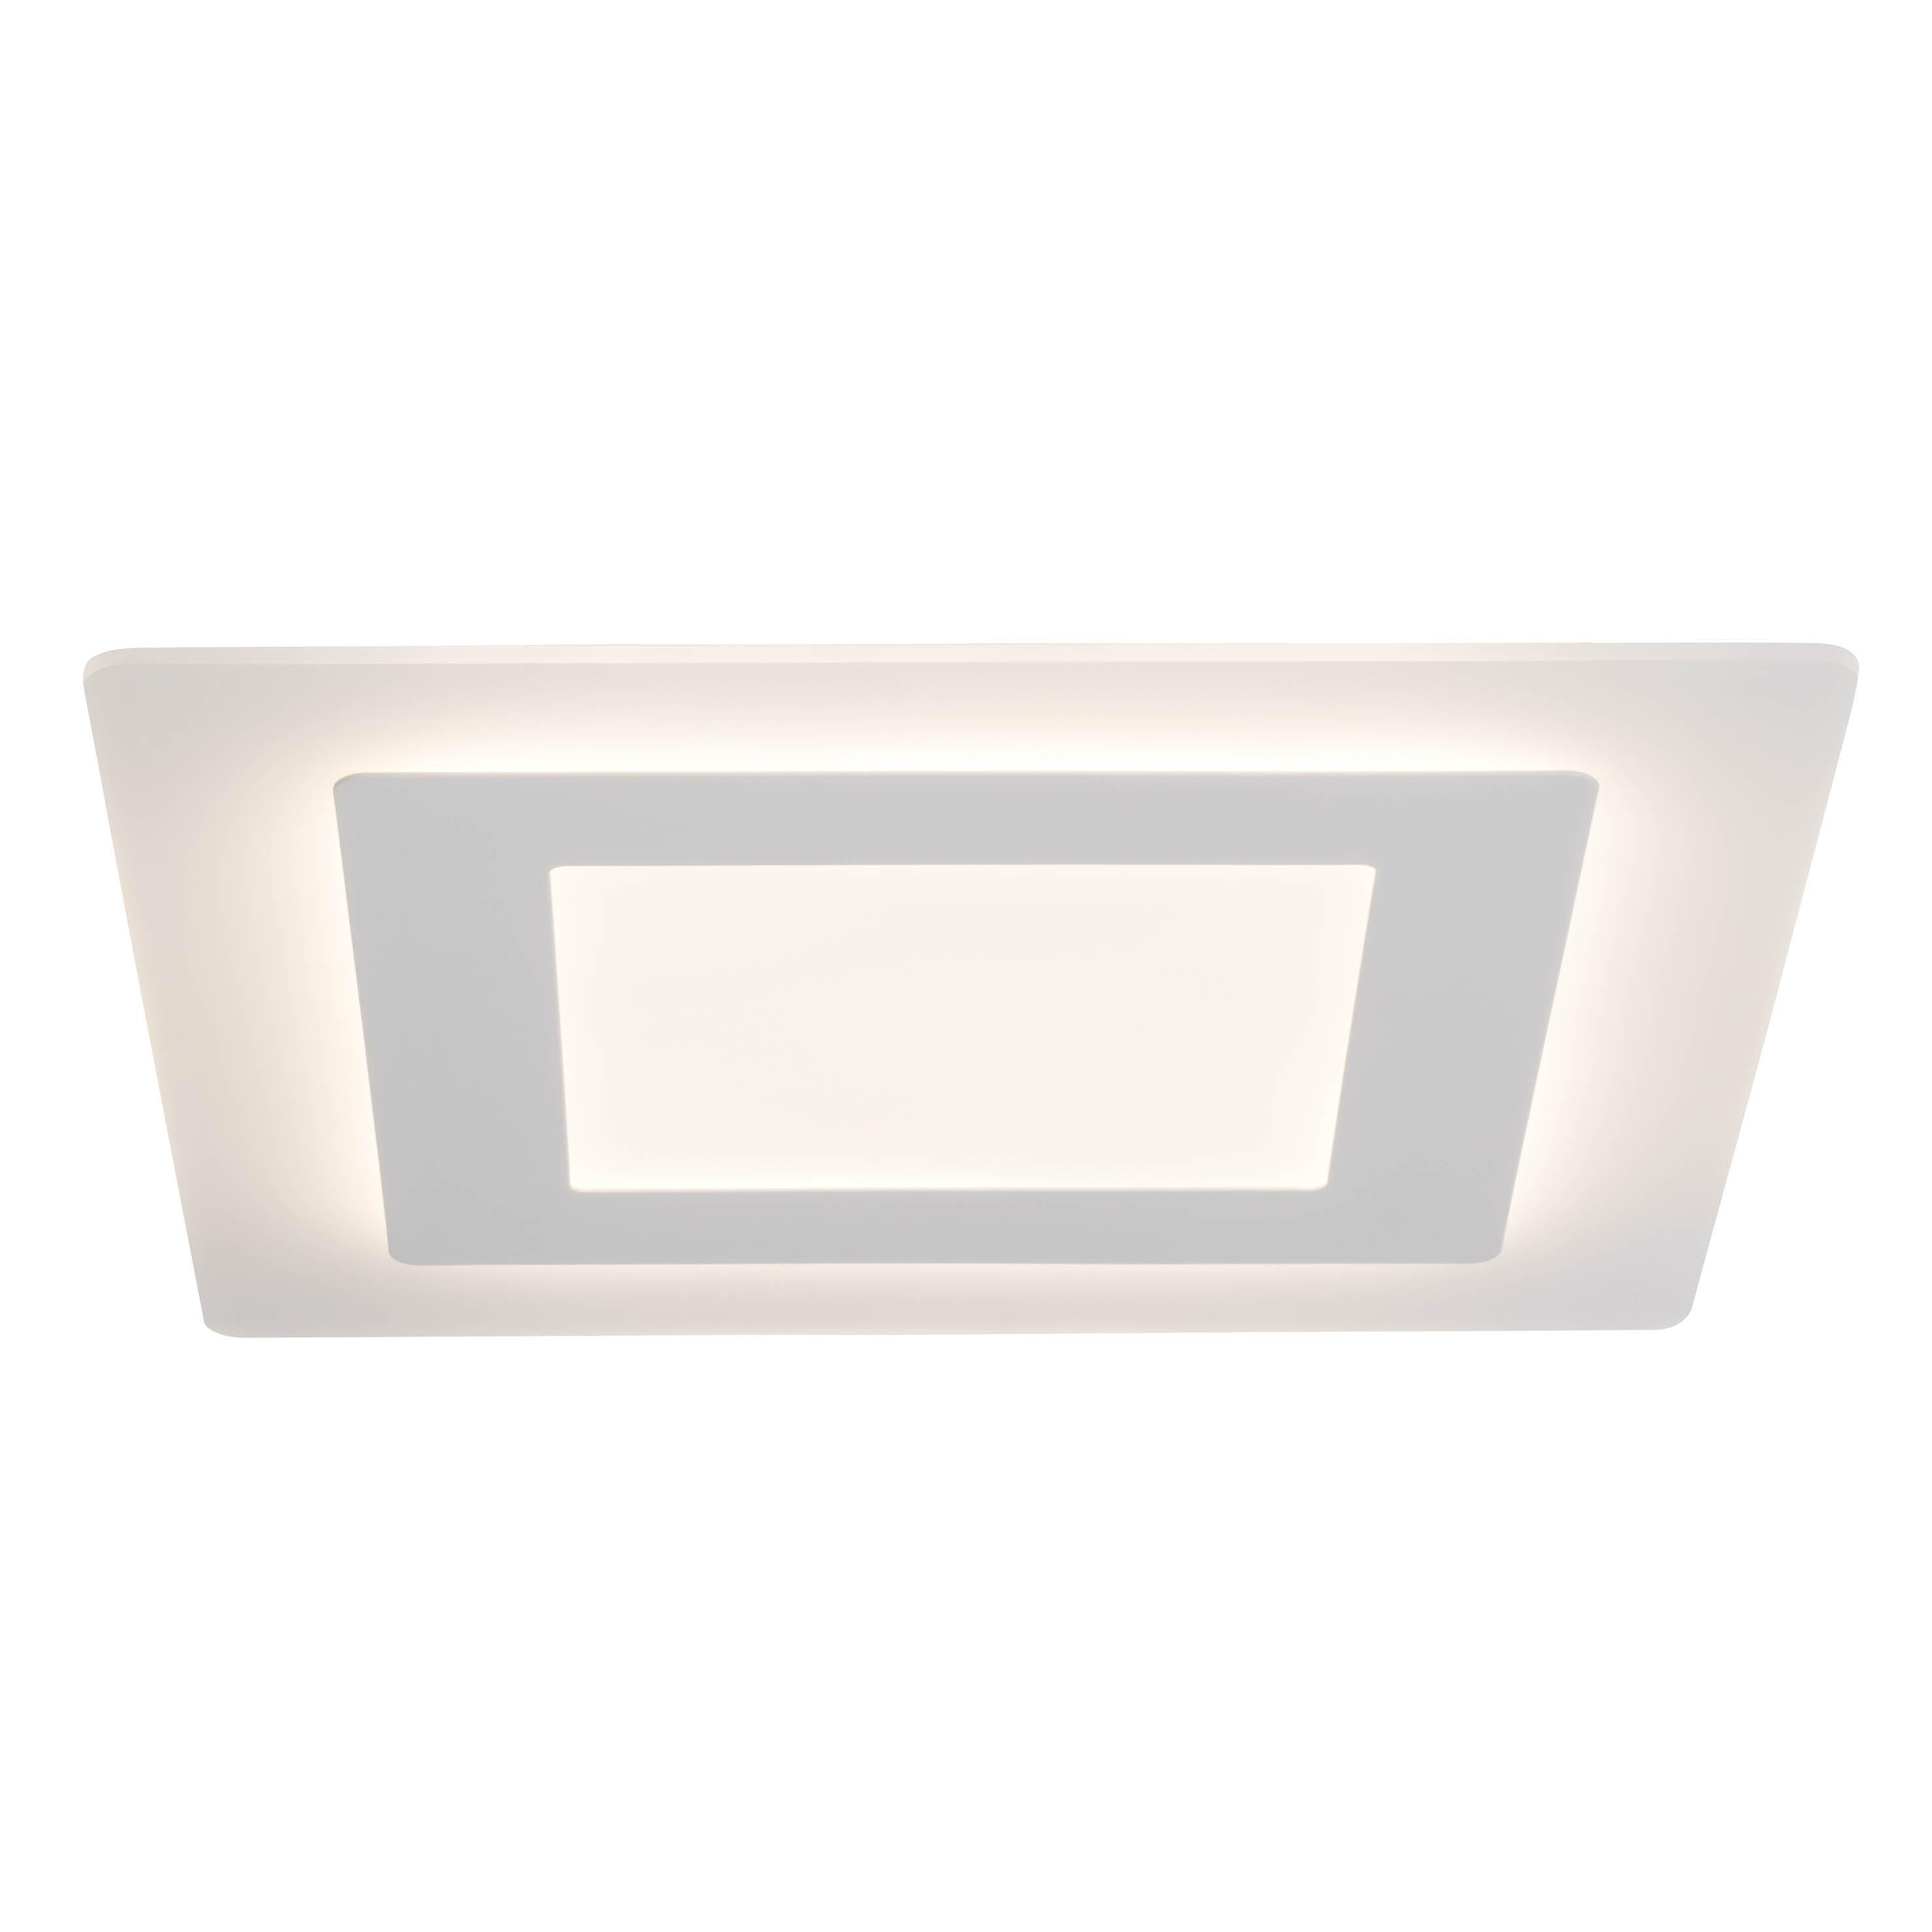 AEG Xenos LED Deckenleuchte 48x48cm weiÃY